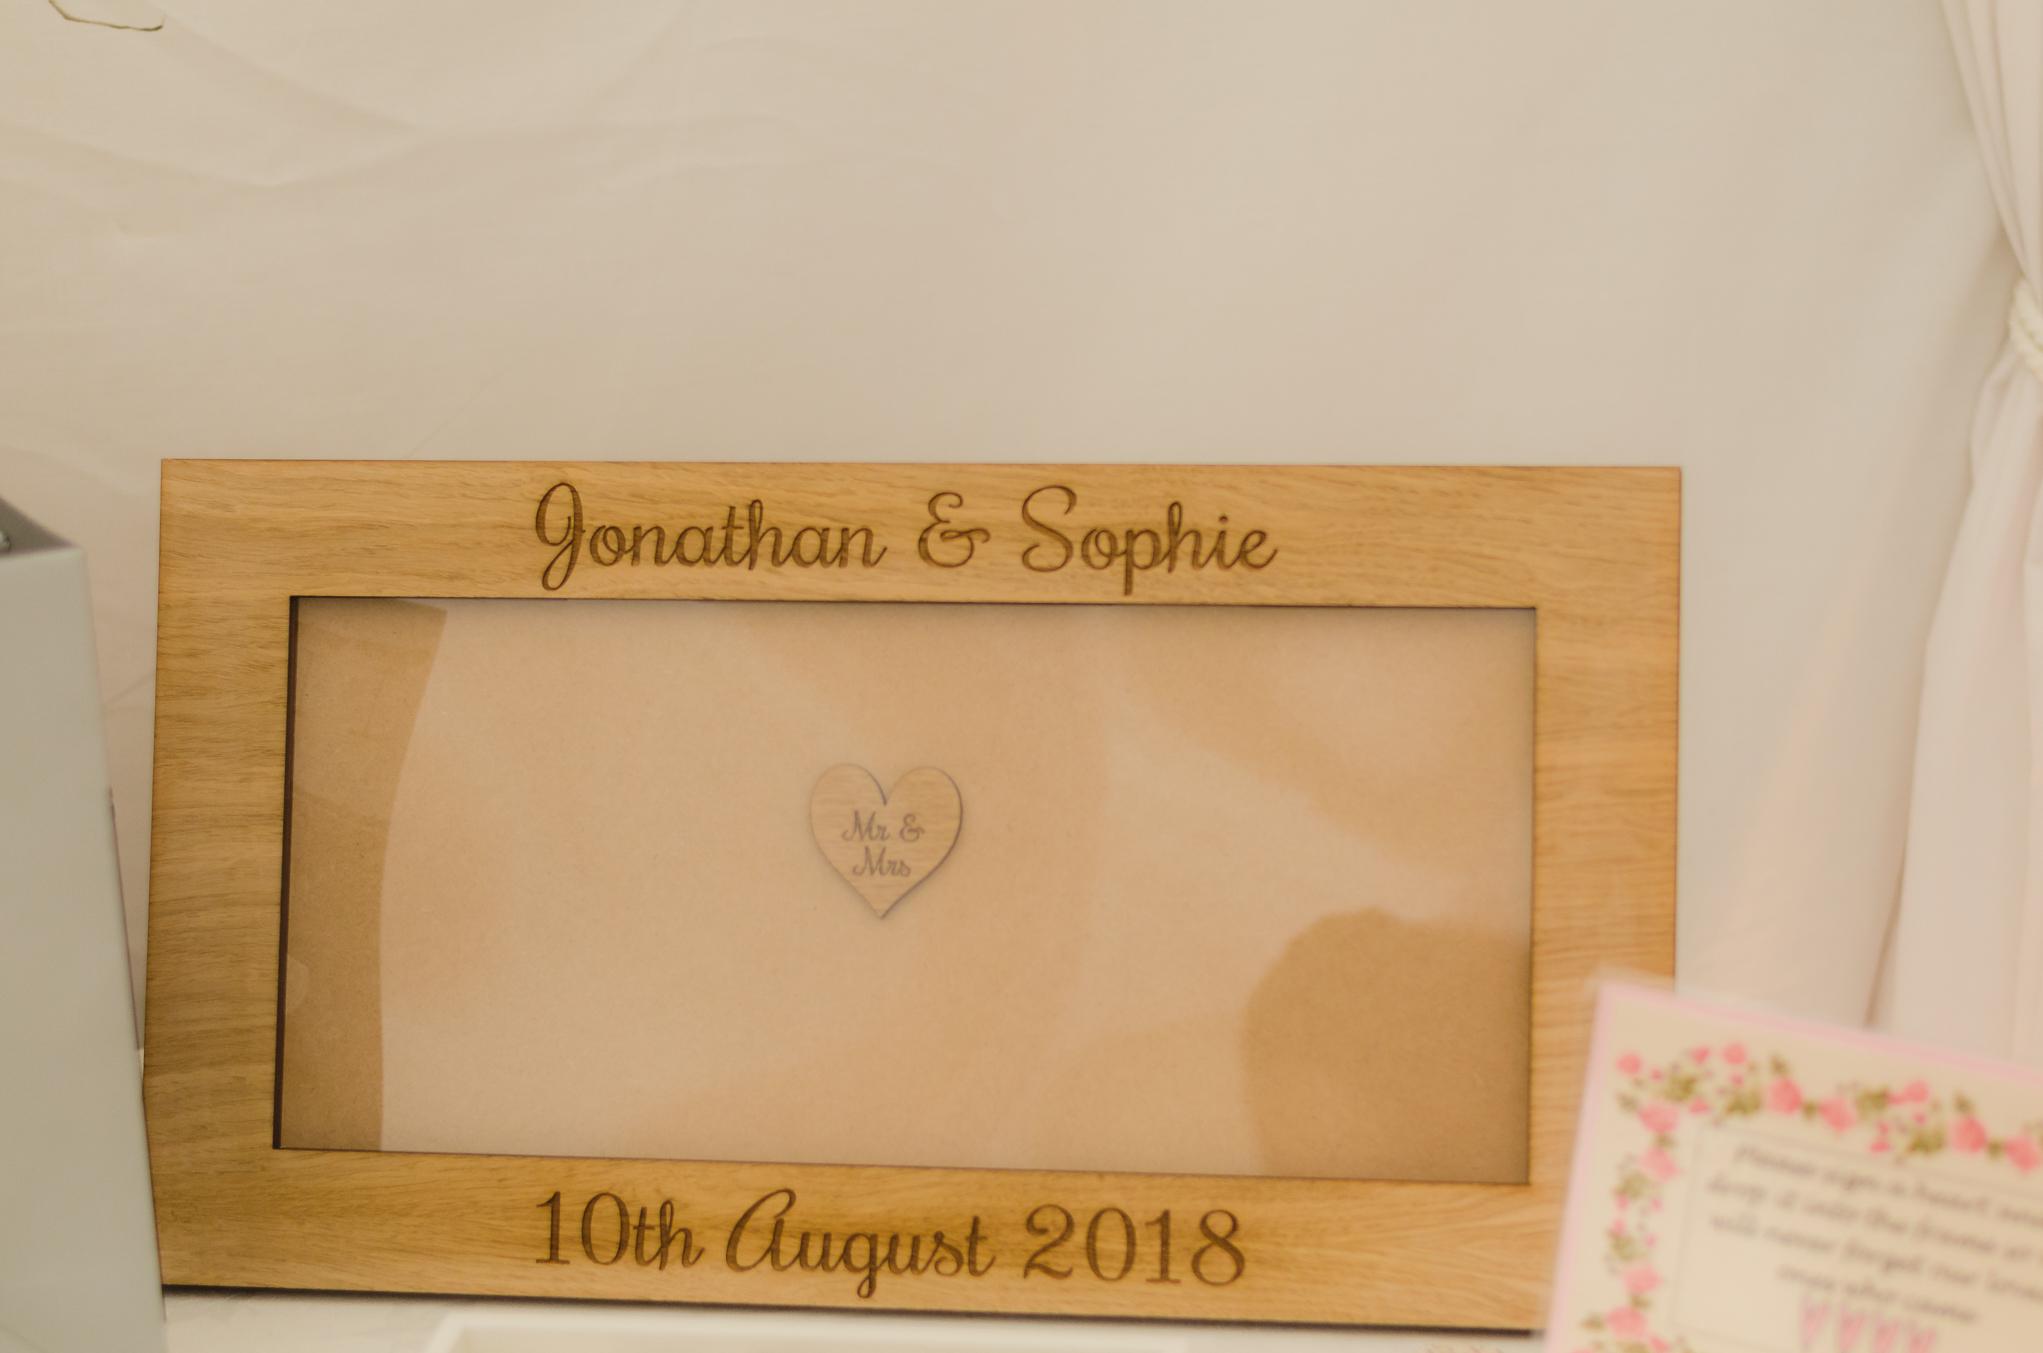 Sophie and Jon